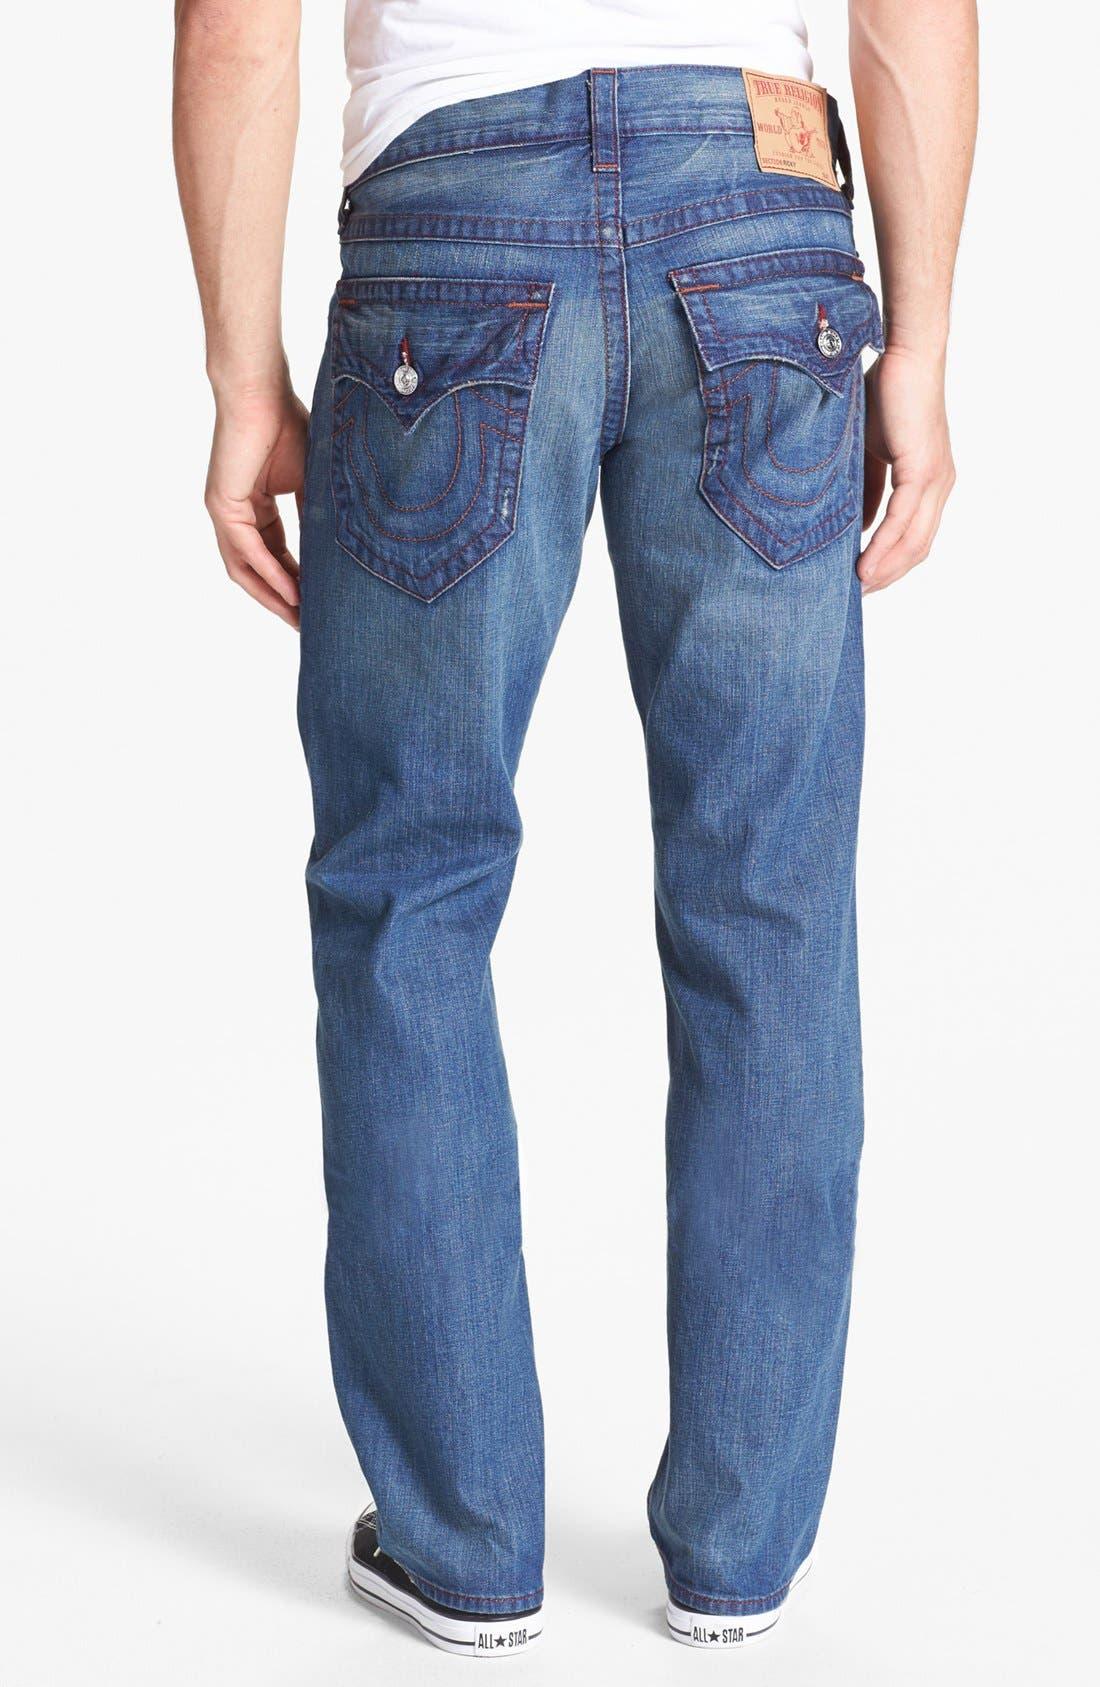 Main Image - True Religion Brand Jeans 'Ricky' Straight Leg Jeans (Medium Drifter)